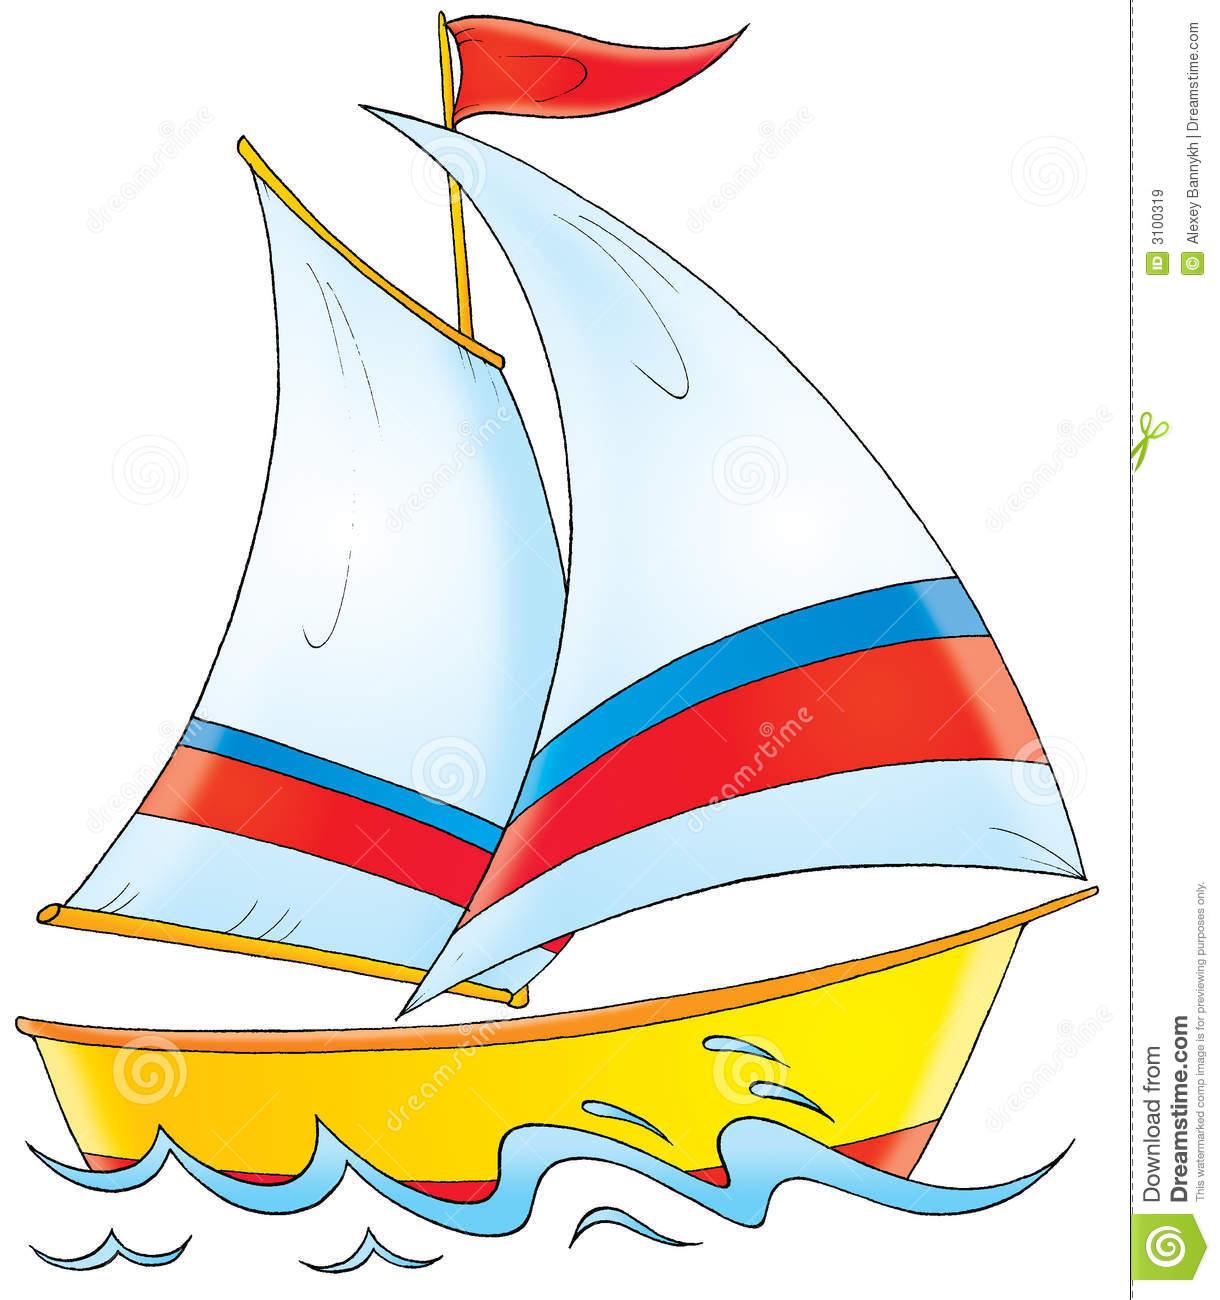 Yacht free clip art. Boat clipart vector